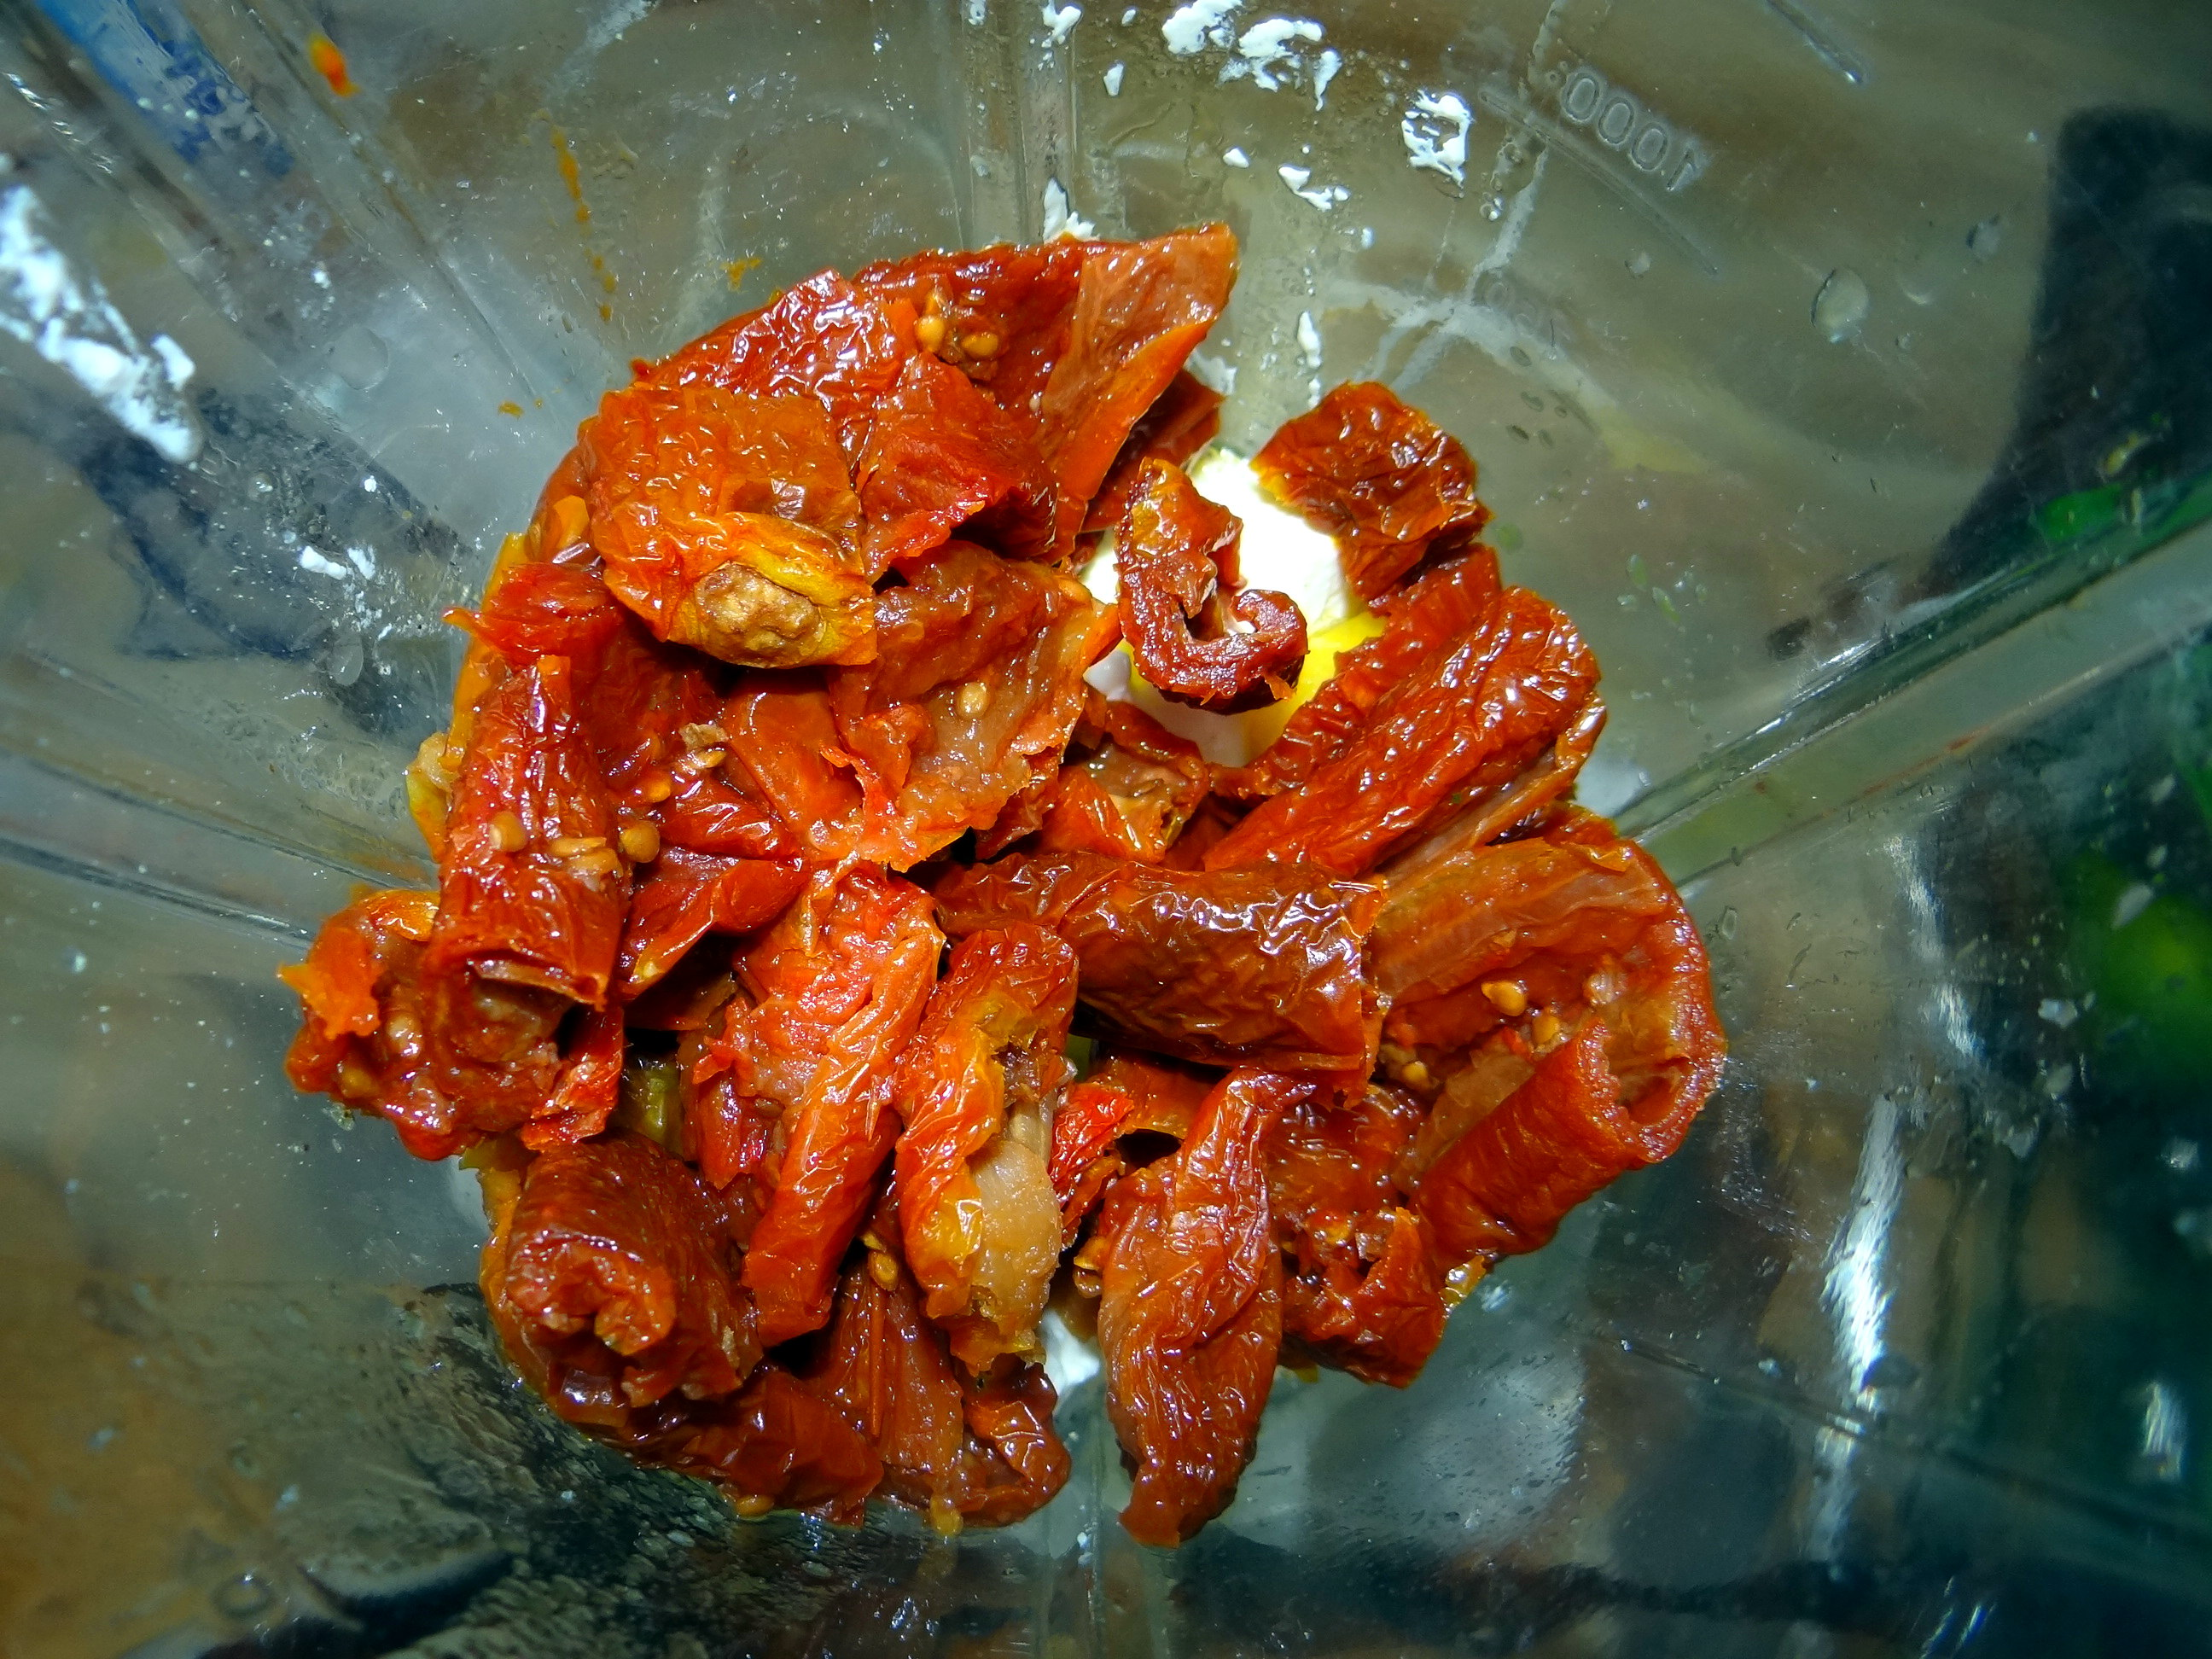 Süßkartoffel Spalten,Feta Creme,Salate (10)